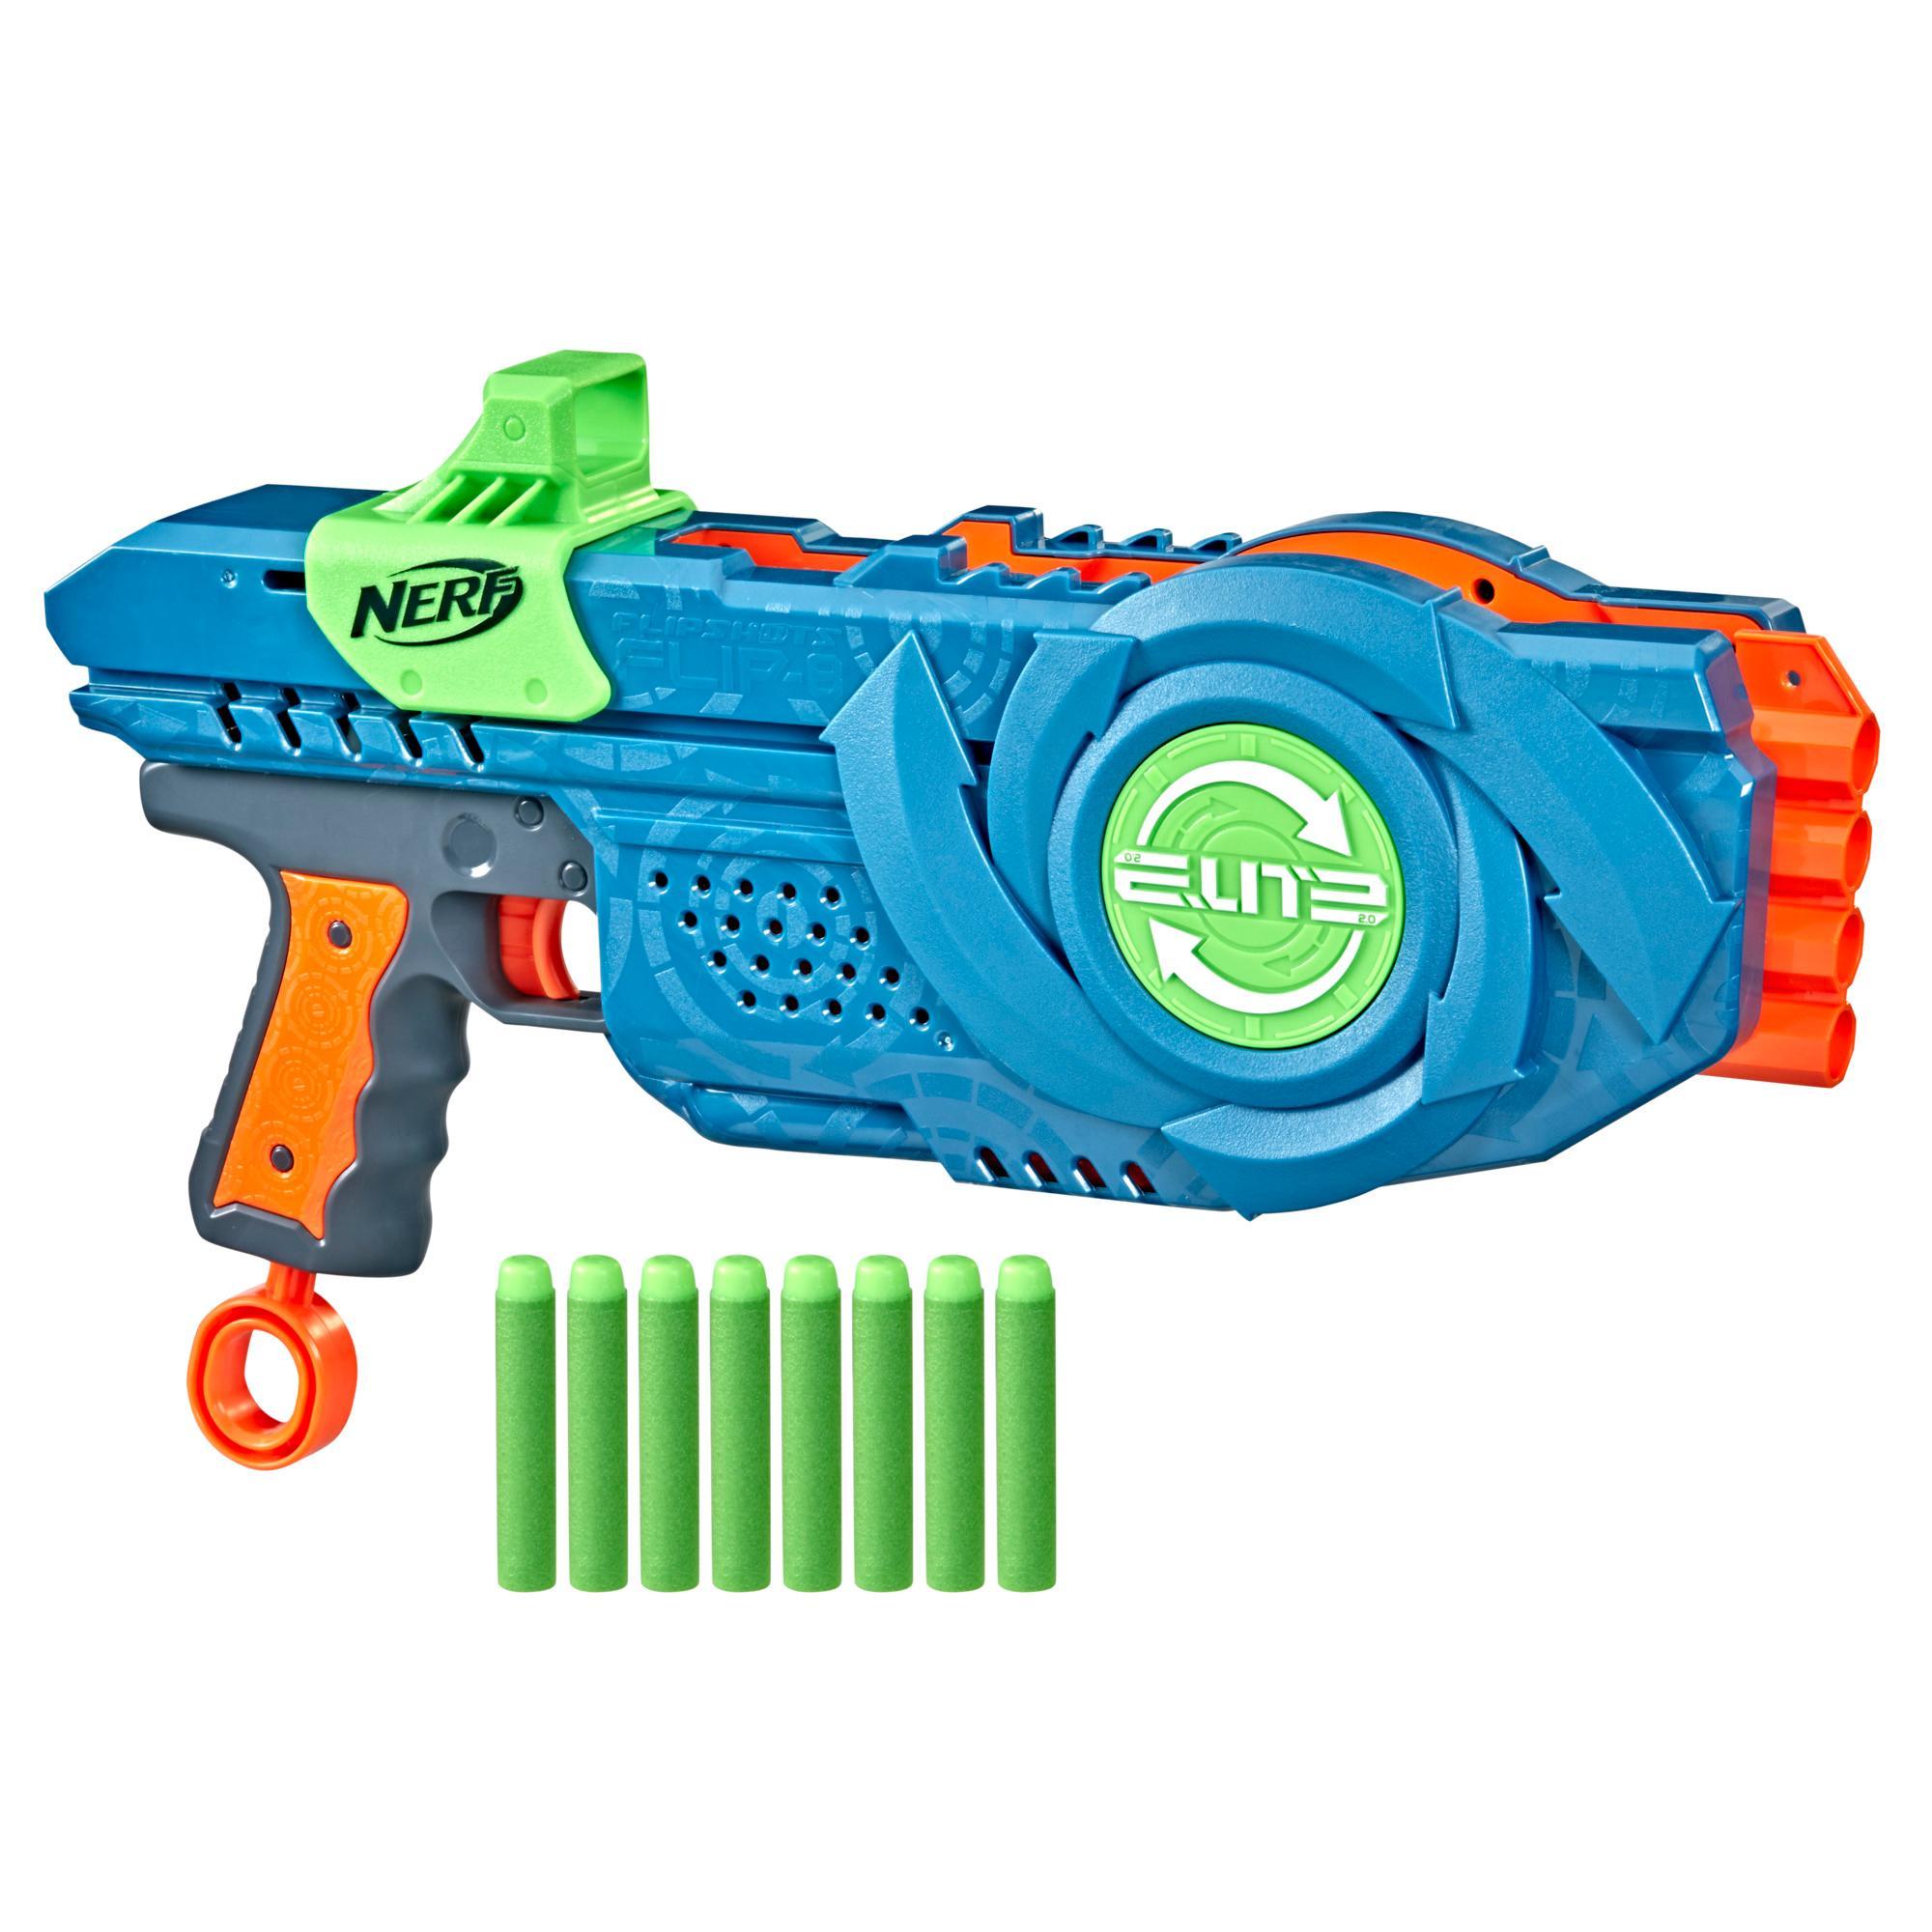 Nerf Elite 2.0 Flipshots Flip-8 Blaster, 8 Dart Barrels Flip to Double Your Firepower, 8-Dart Capacity, 8 Nerf Darts